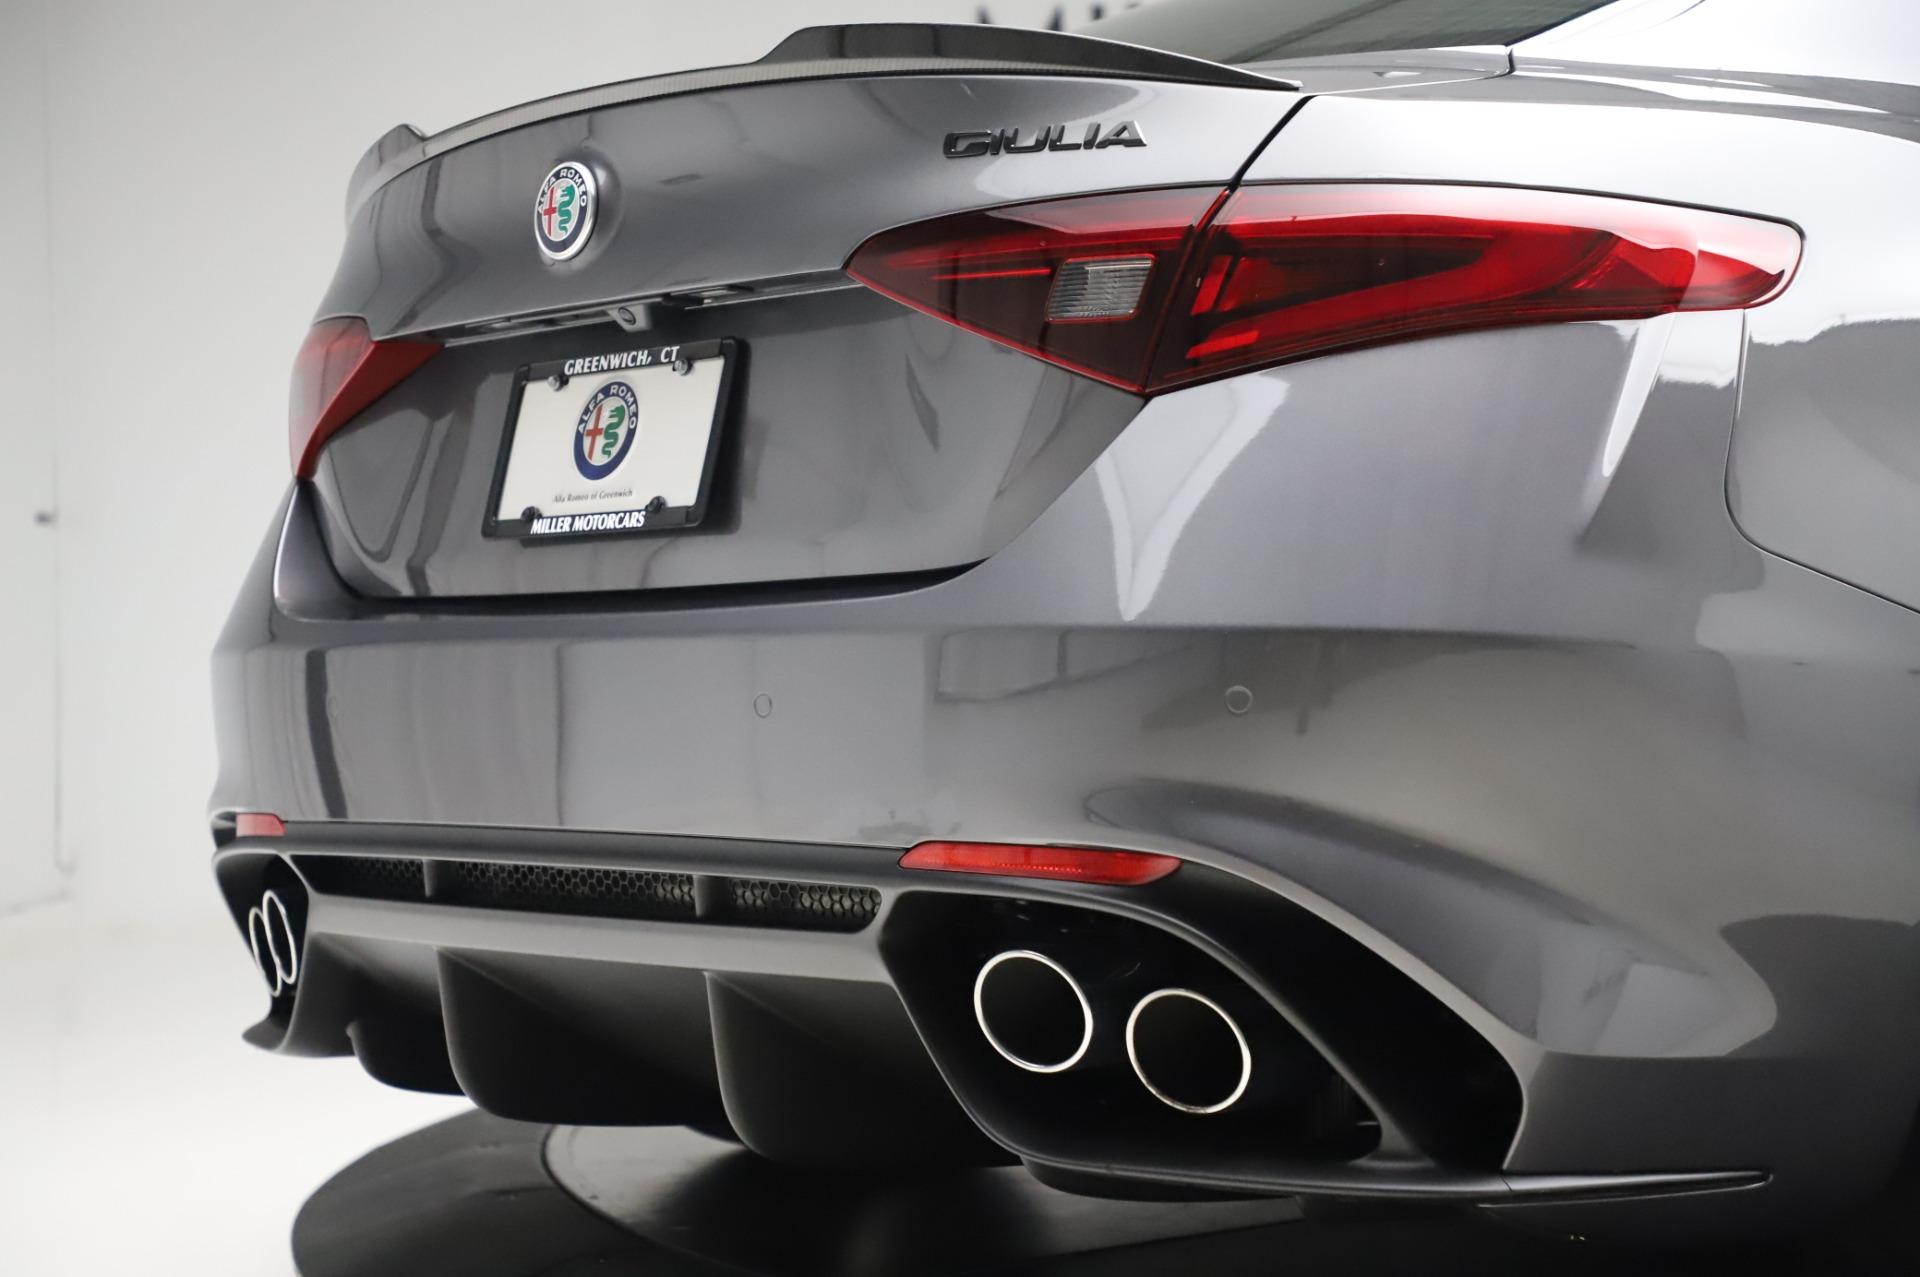 New-2020-Alfa-Romeo-Giulia-Quadrifoglio